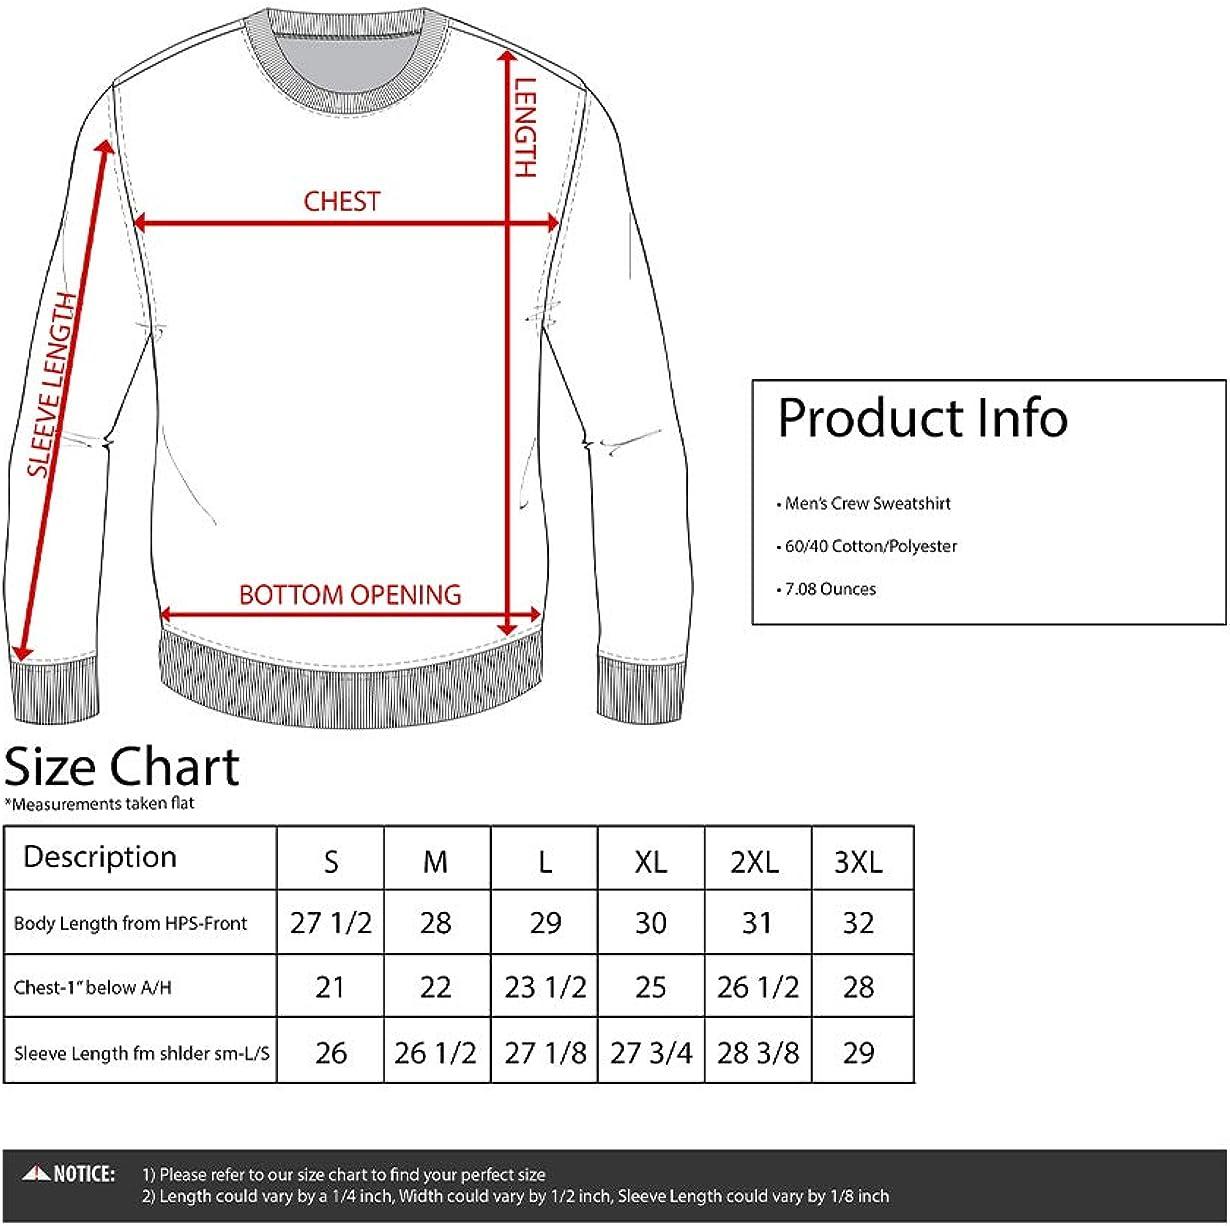 Ripple Junction One Piece Adult Unisex Brook World Tour Fleece Crew Sweatshirt